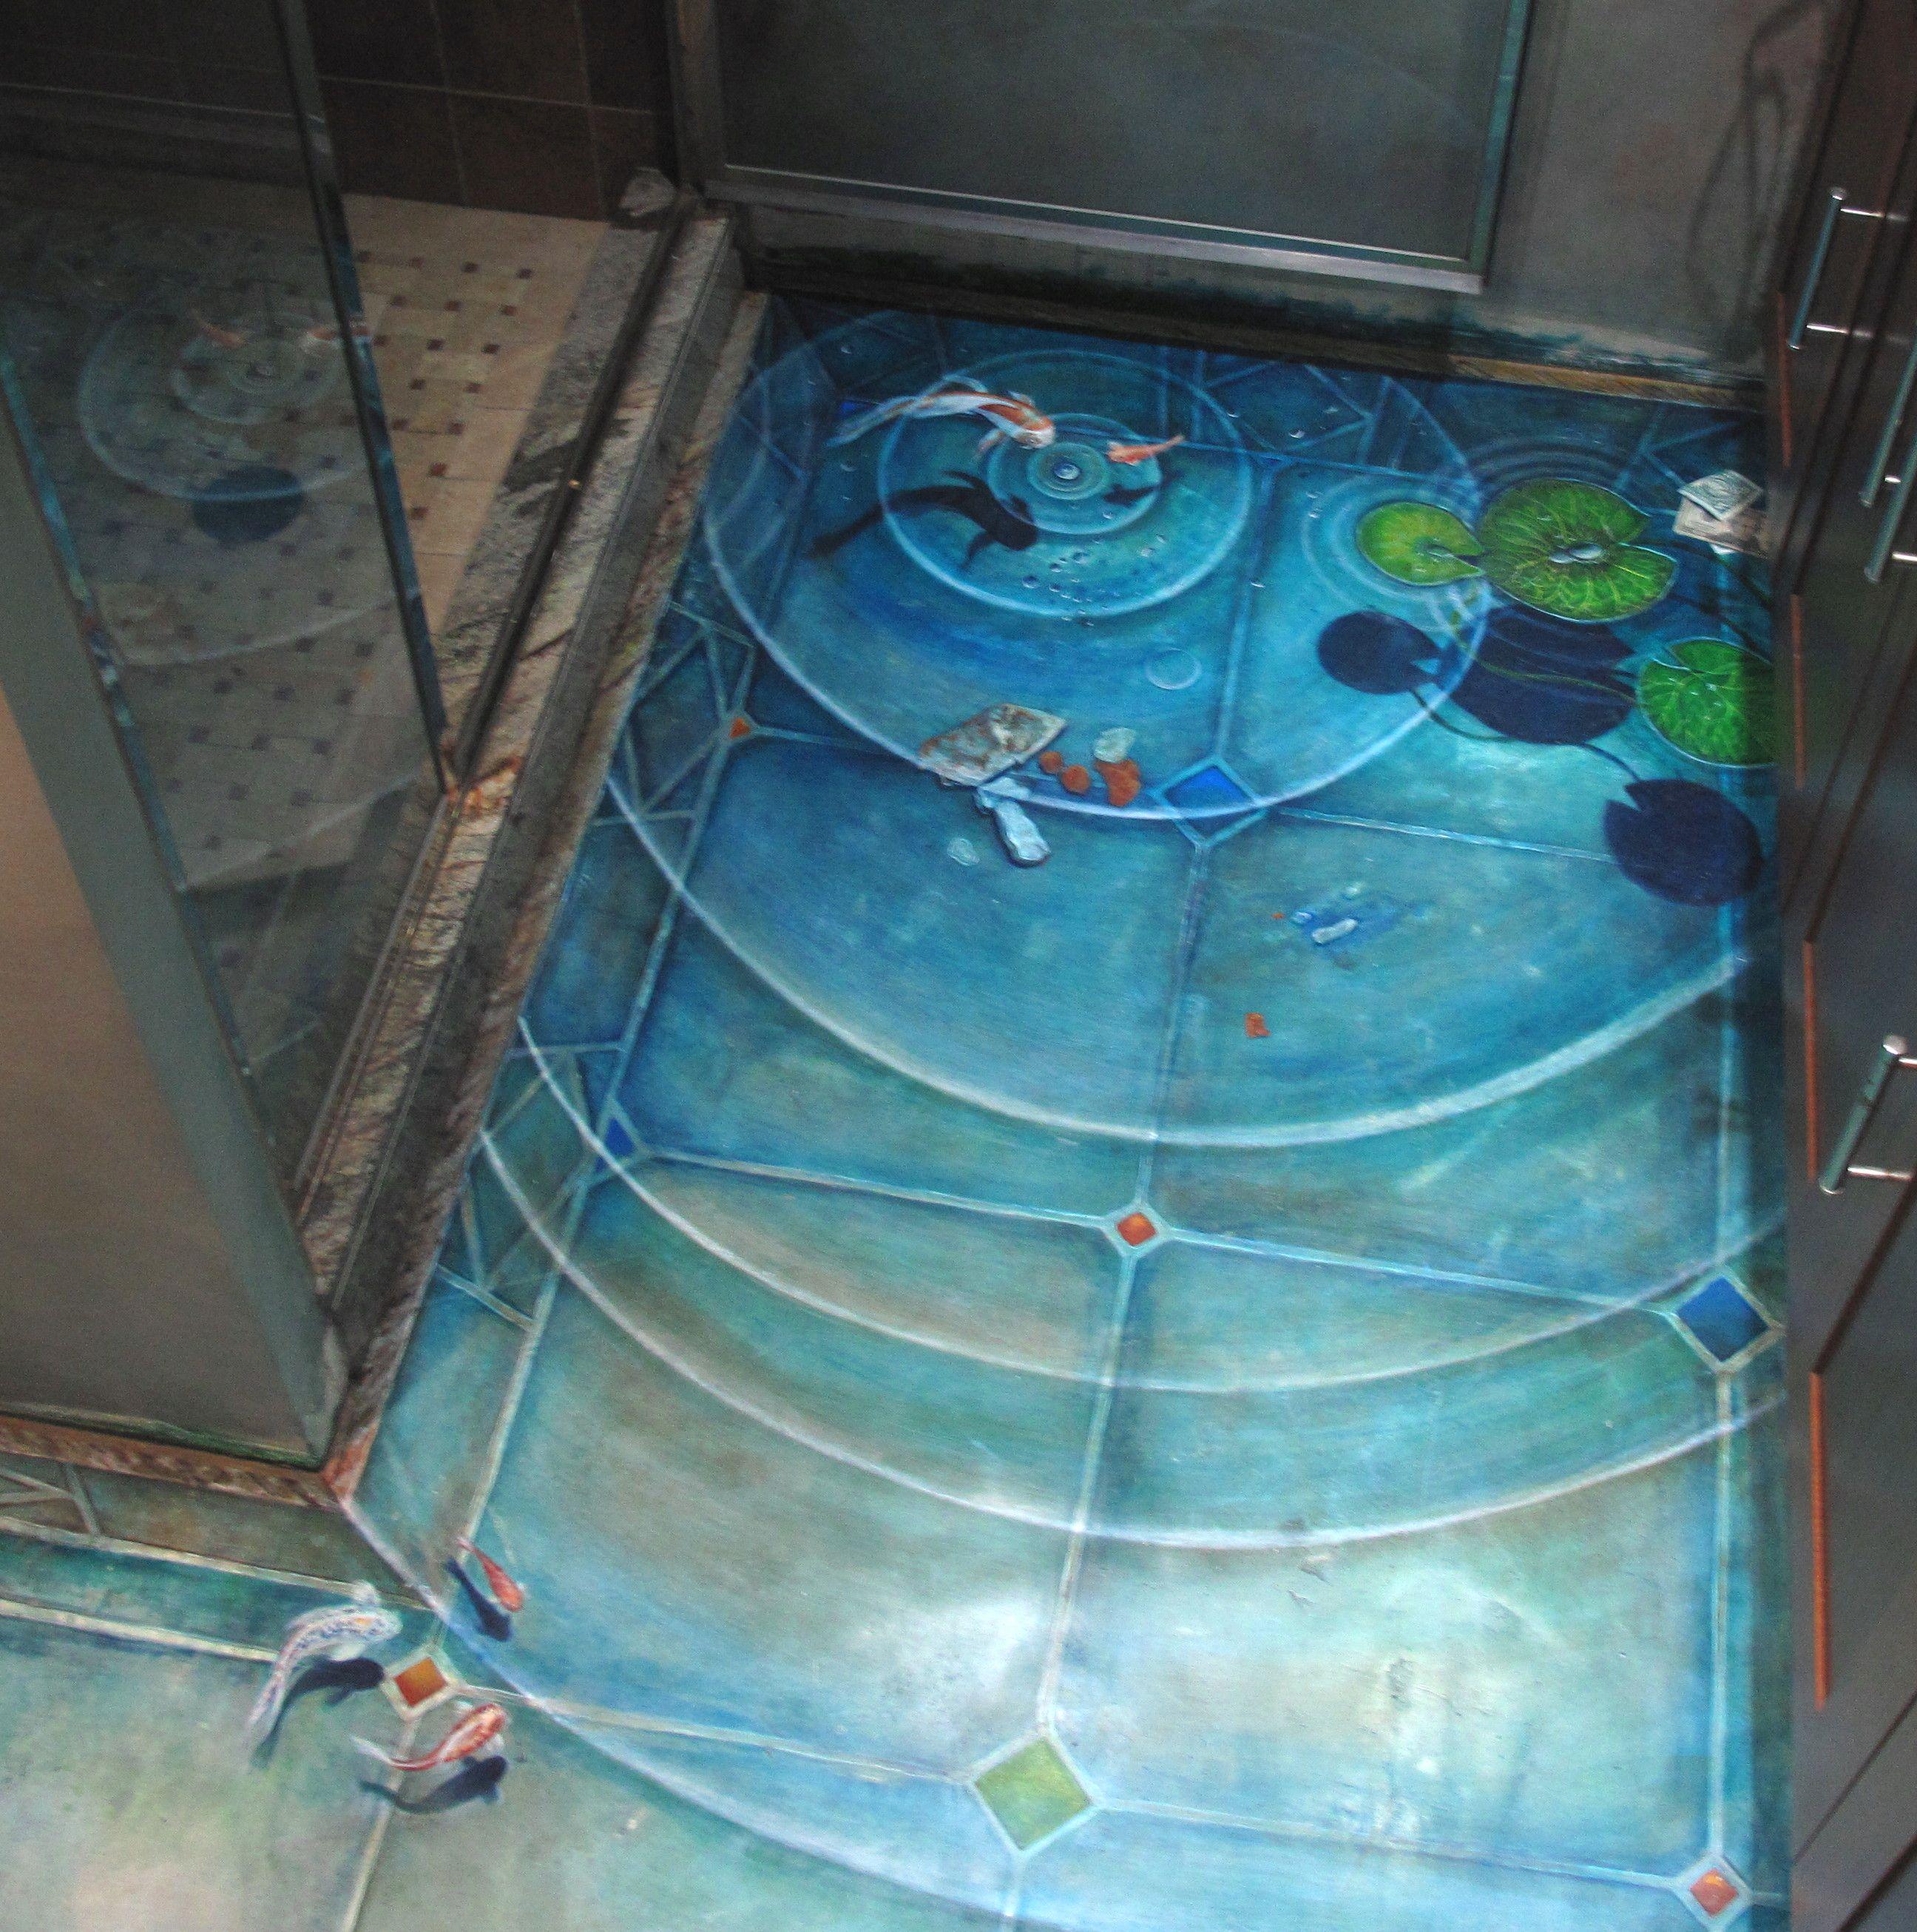 Concrete bathroom floor koi pond casa pinterest for Bathtub fish pond